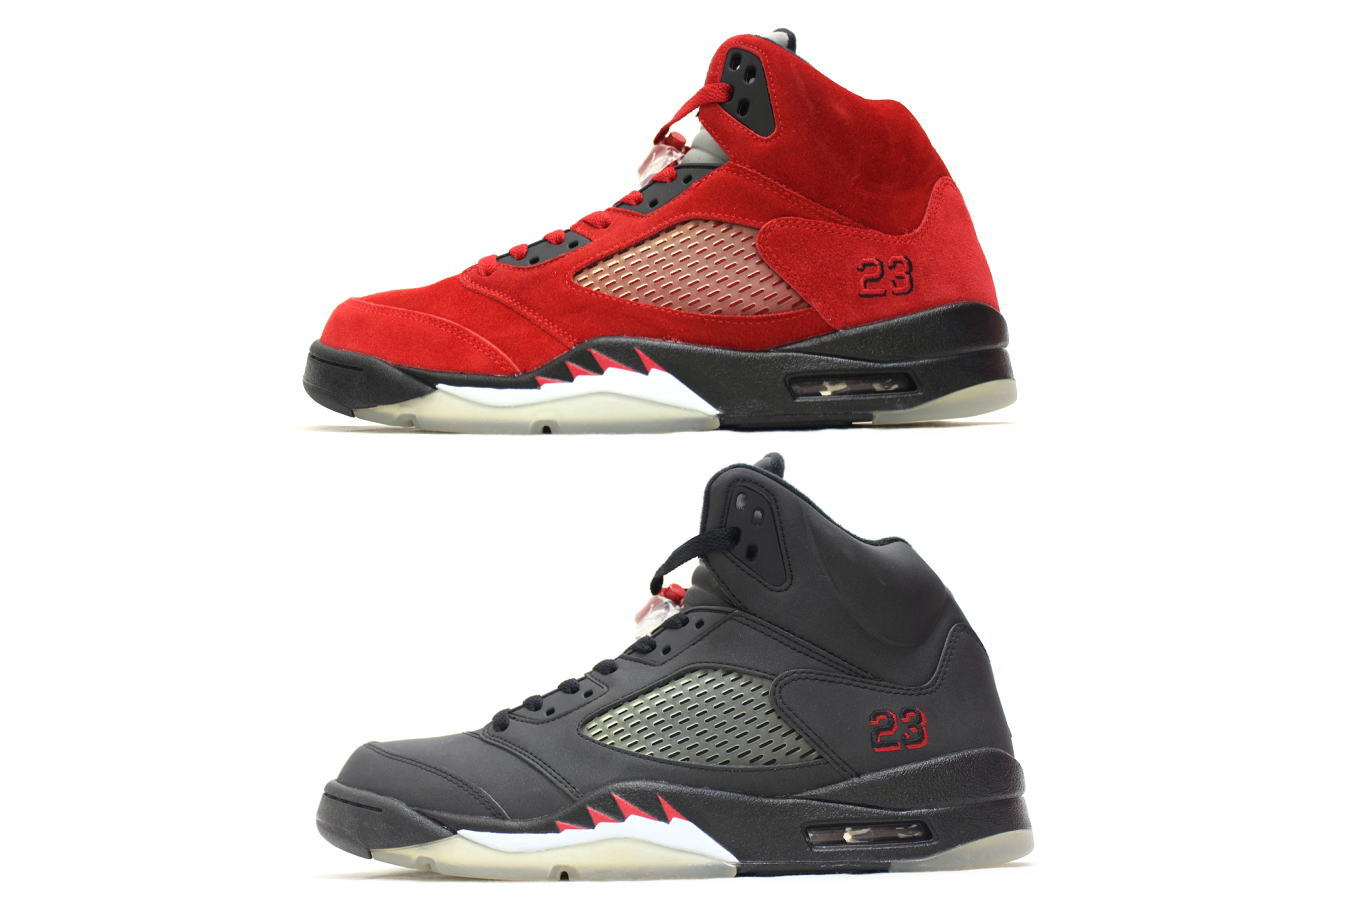 fa8e4154de5 ... NIKE AIR JORDAN 5 RETRO DMP bipedal set 360968-991 Nike Jordan retro 5  RAGING ...